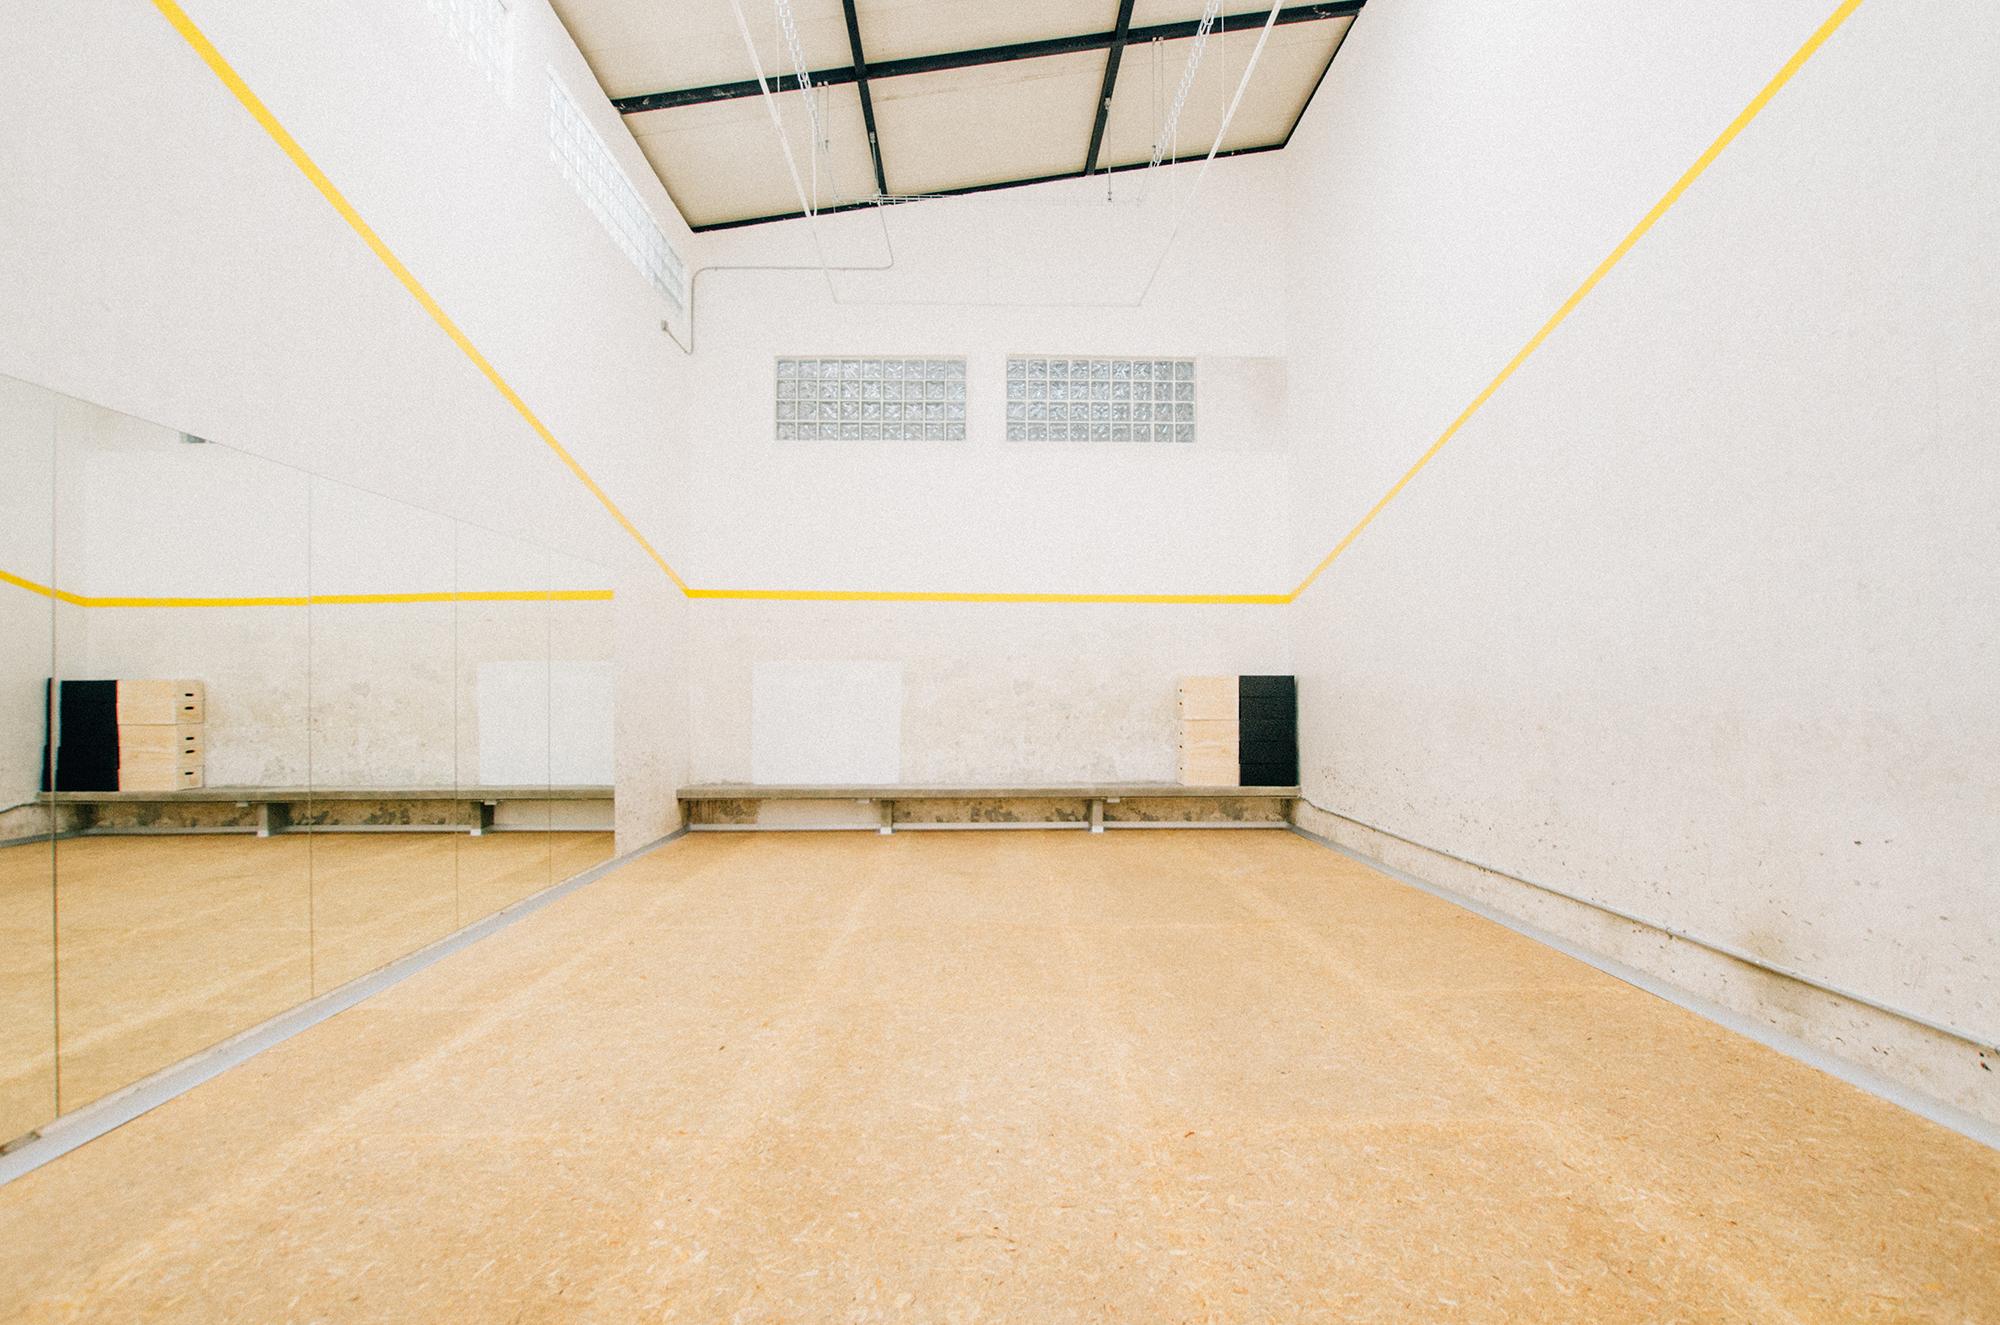 Salon 1 para renta. 5 x 10 metros